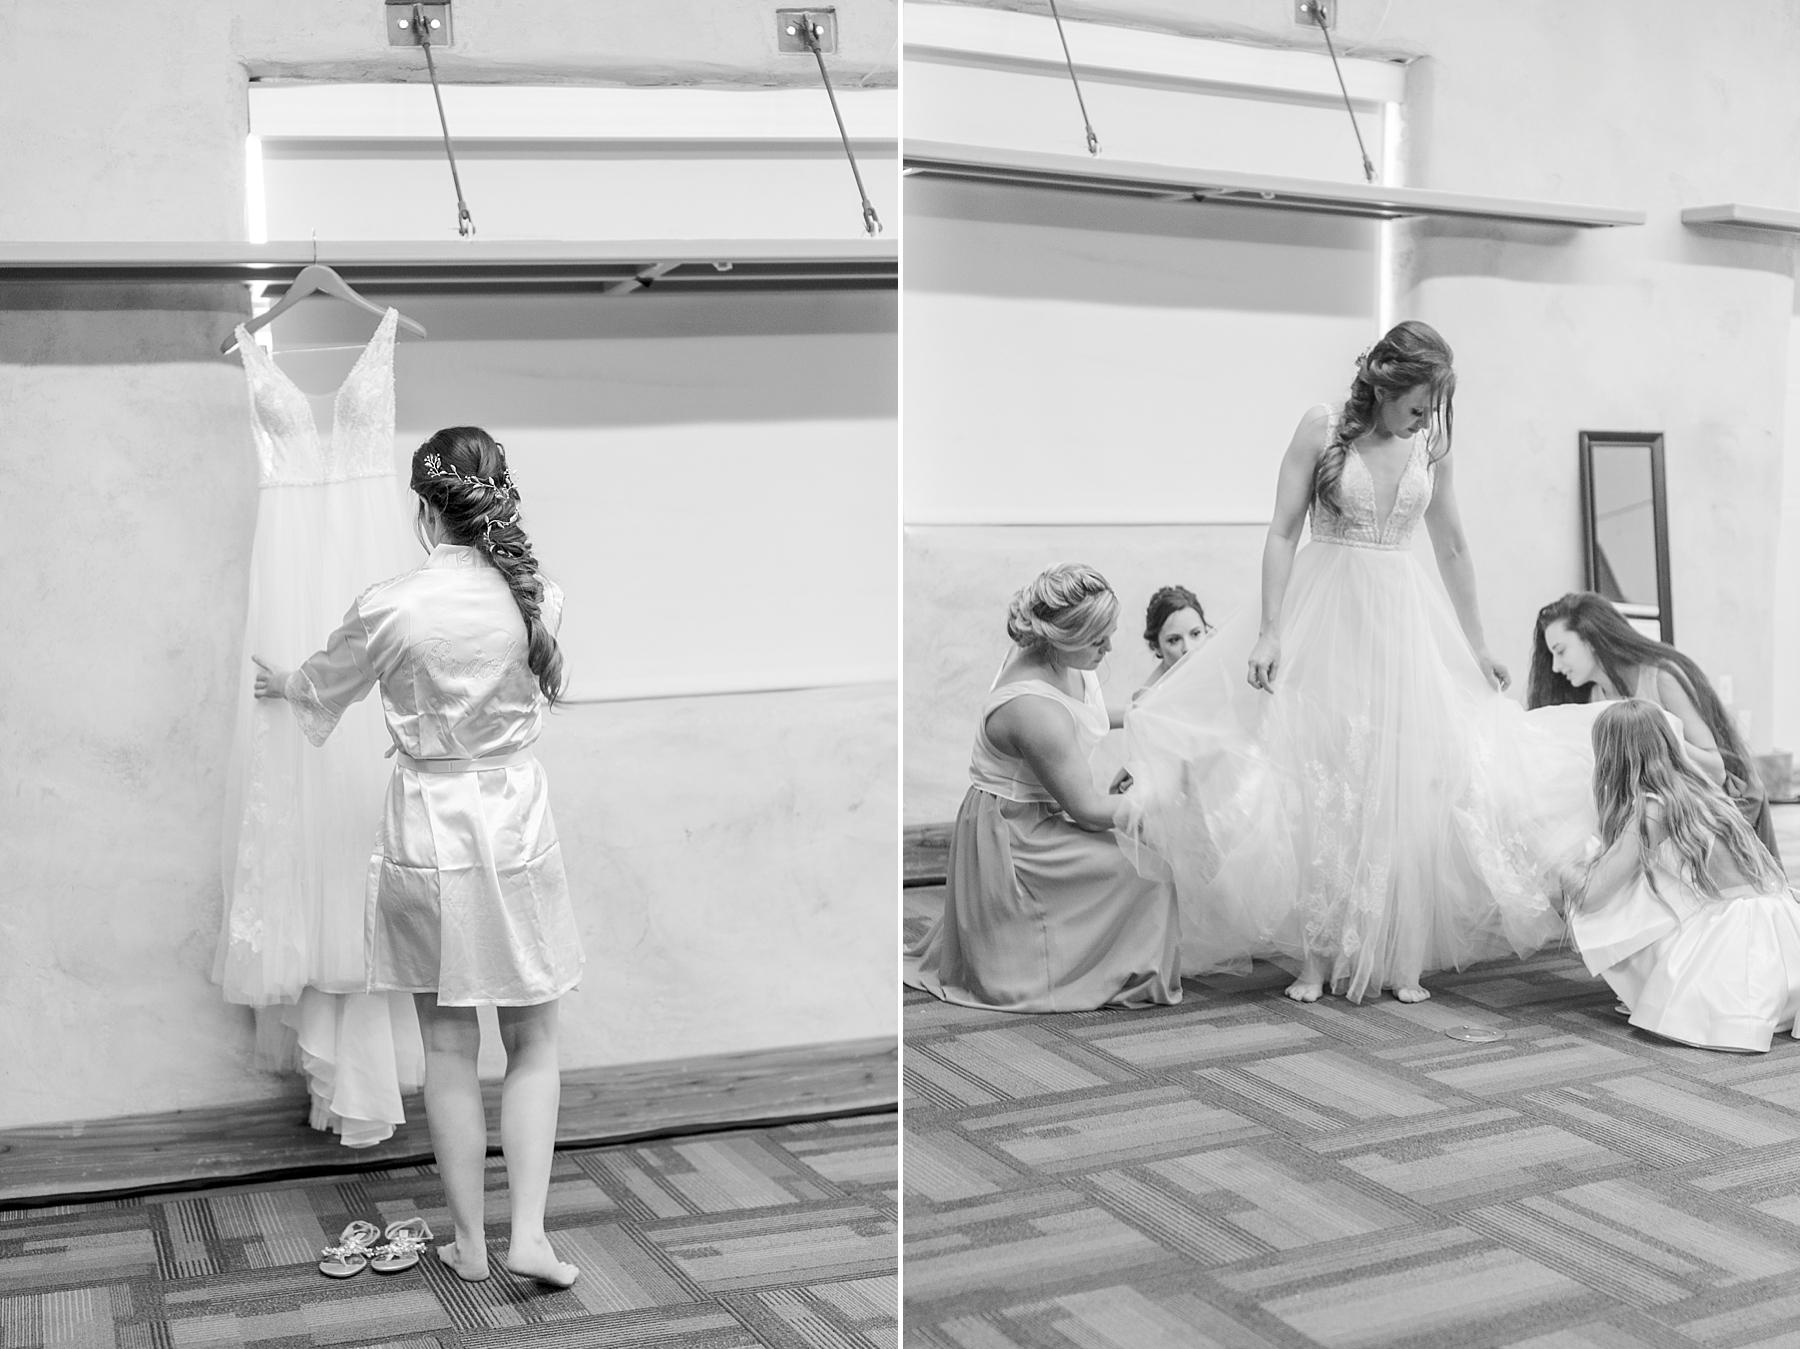 springs-preserve-wedding-las-vegas-destination-photography-the-emerics-06.jpg